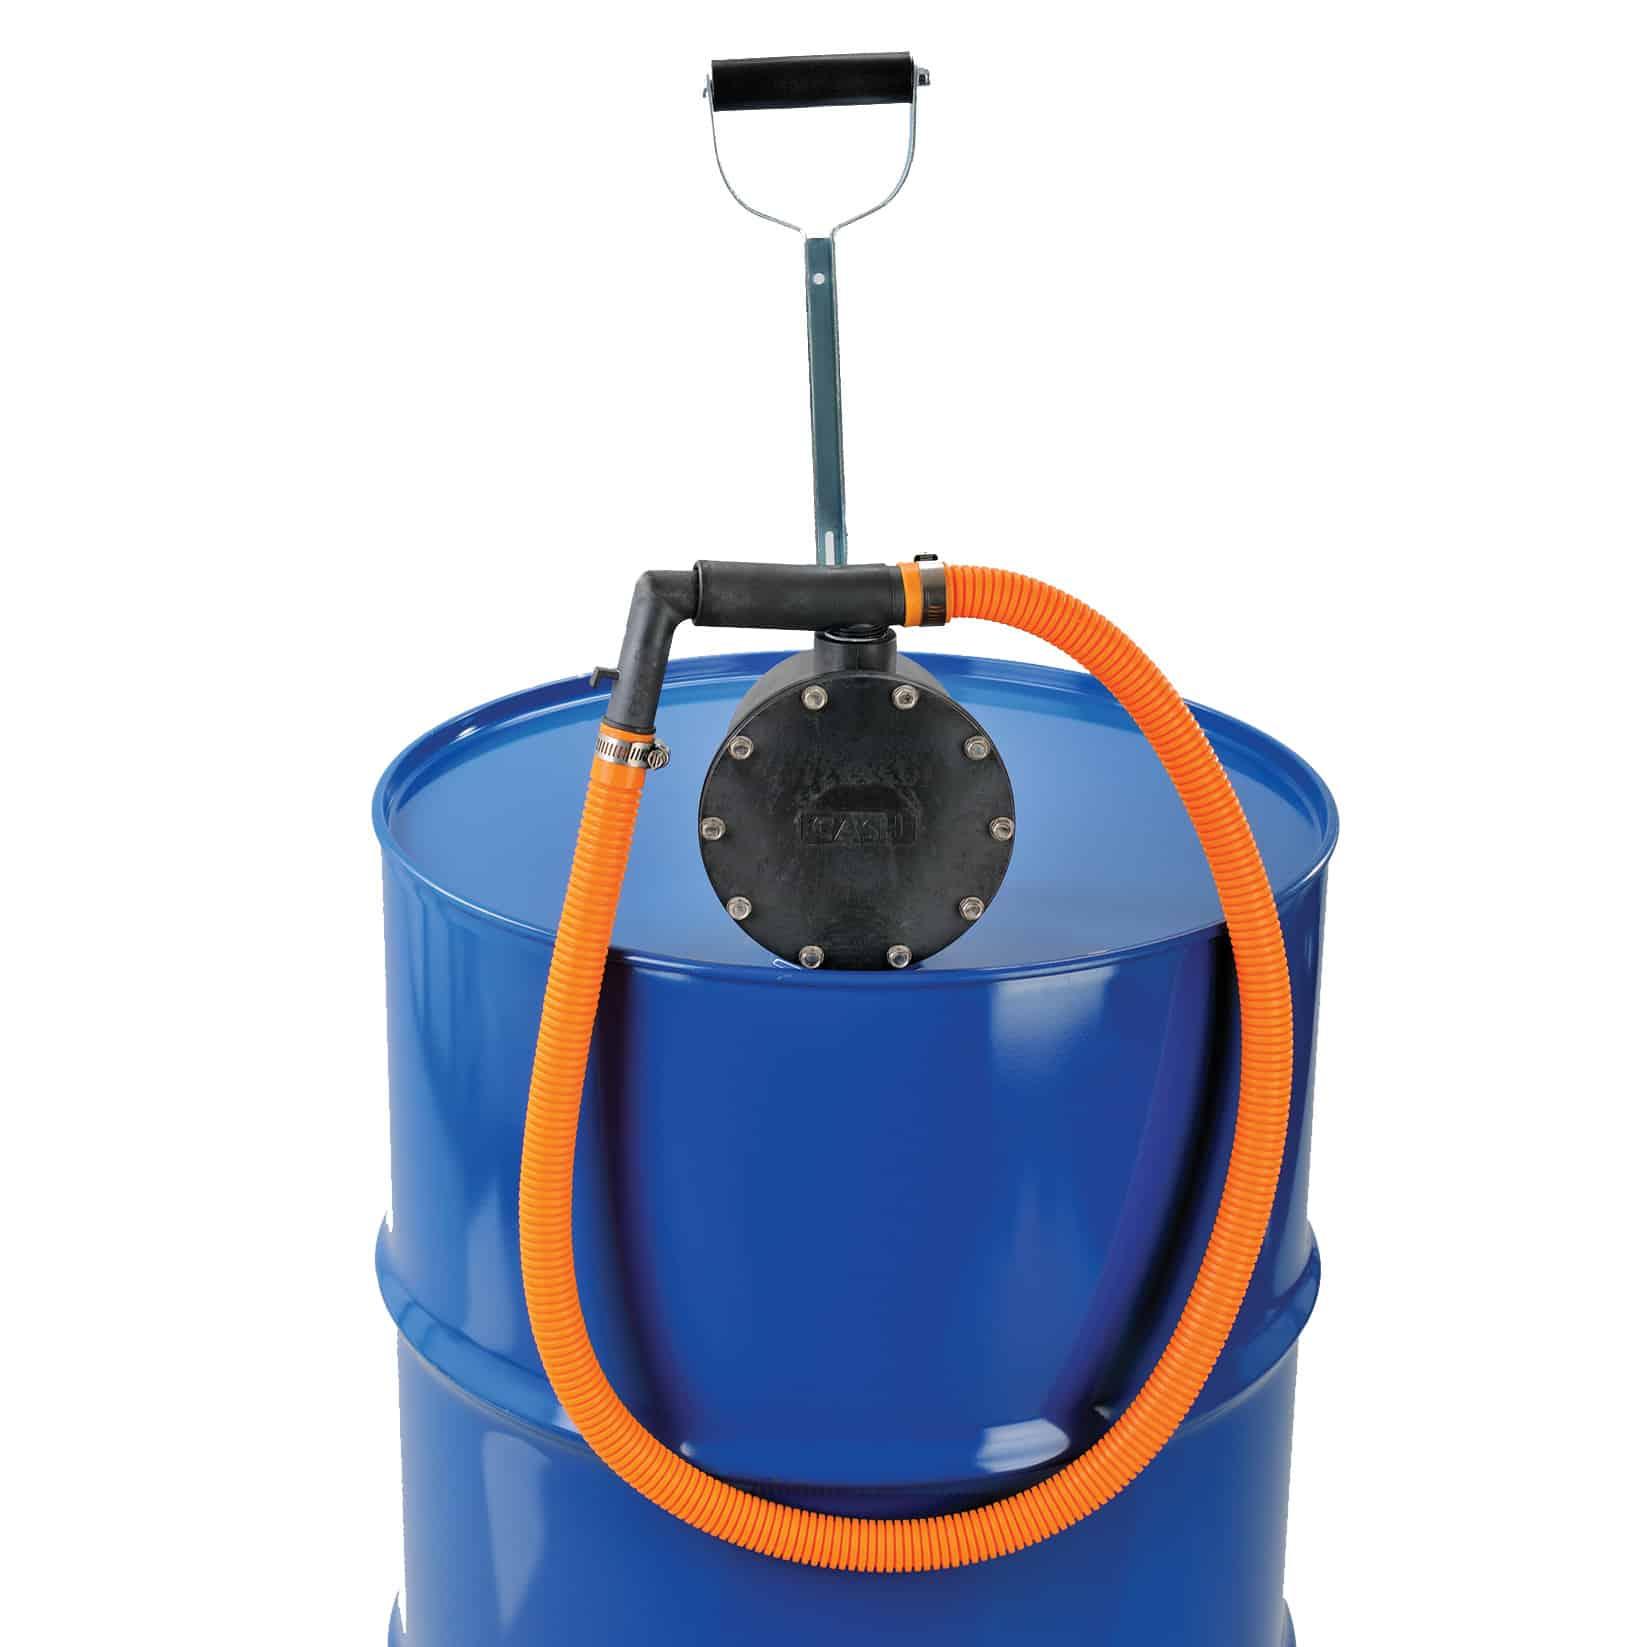 Manually Operated Plastic Piston Barrel Pumps